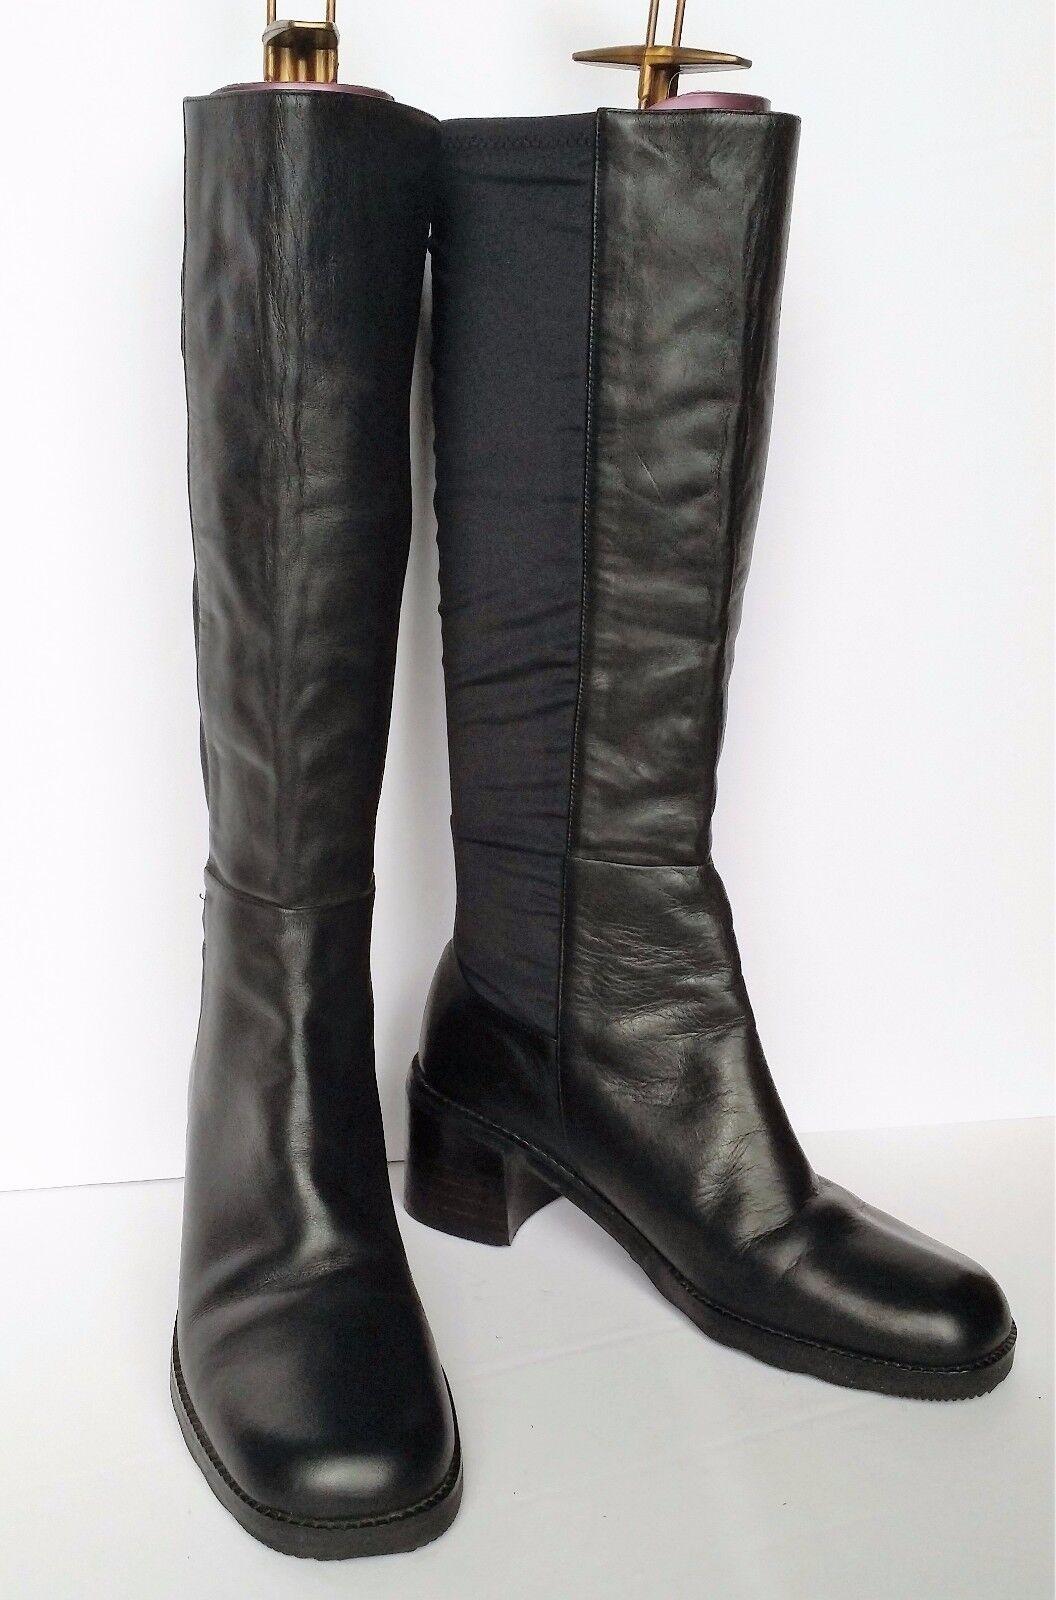 Divertente Women's Size 7 M Black Leather Kneehigh Boots Stretch Sides